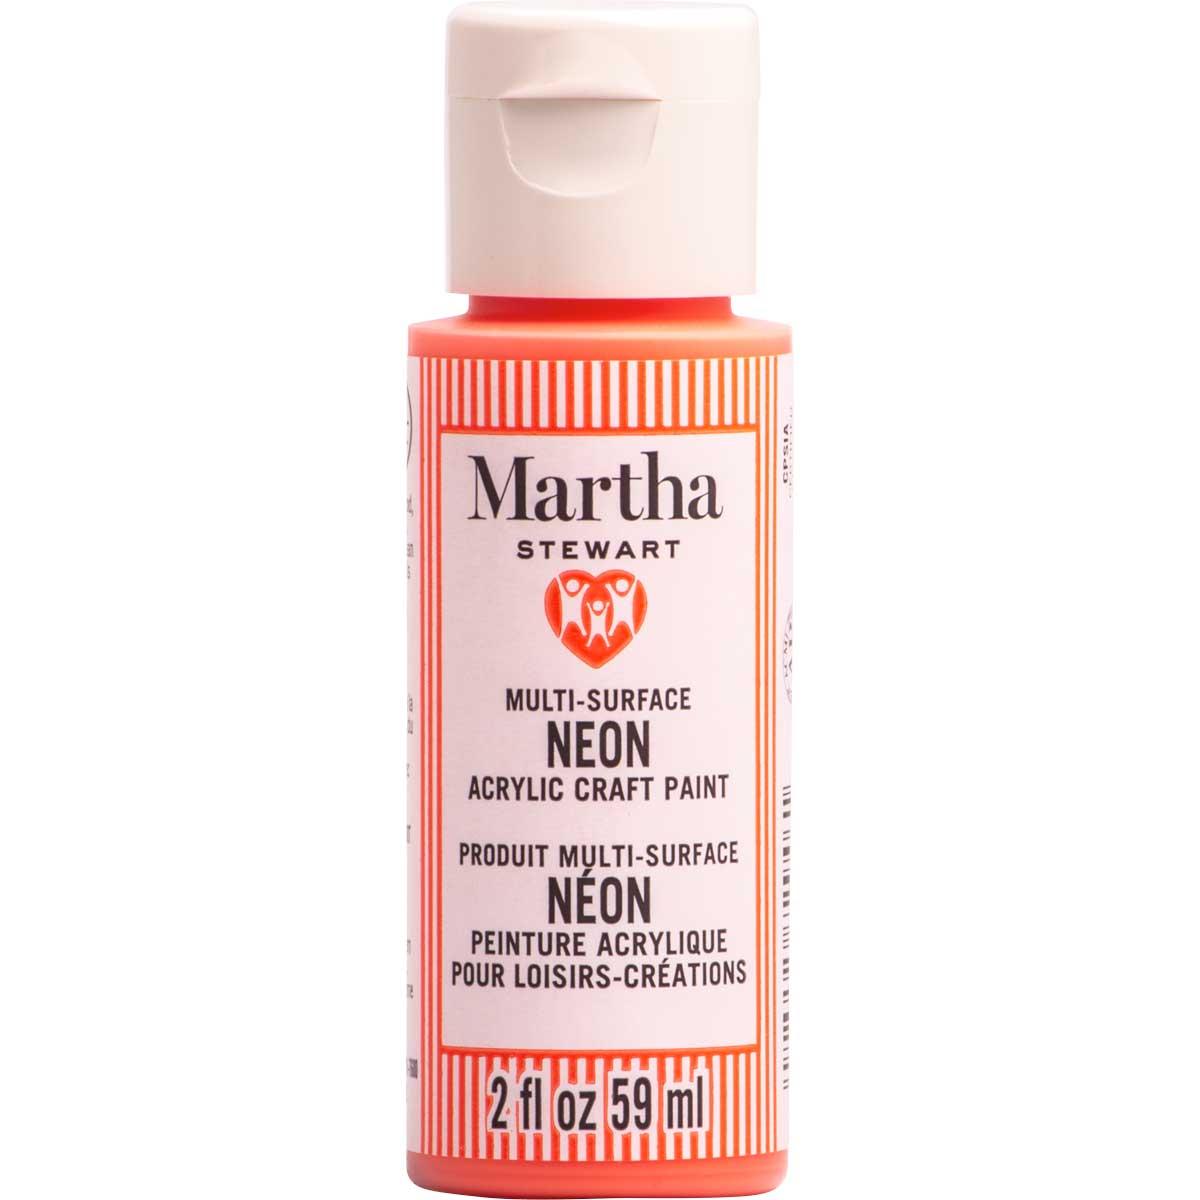 Martha Stewart ® Multi-Surface Neon Acrylic Craft Paint CPSIA - Solar Flare, 2 oz. - 72946